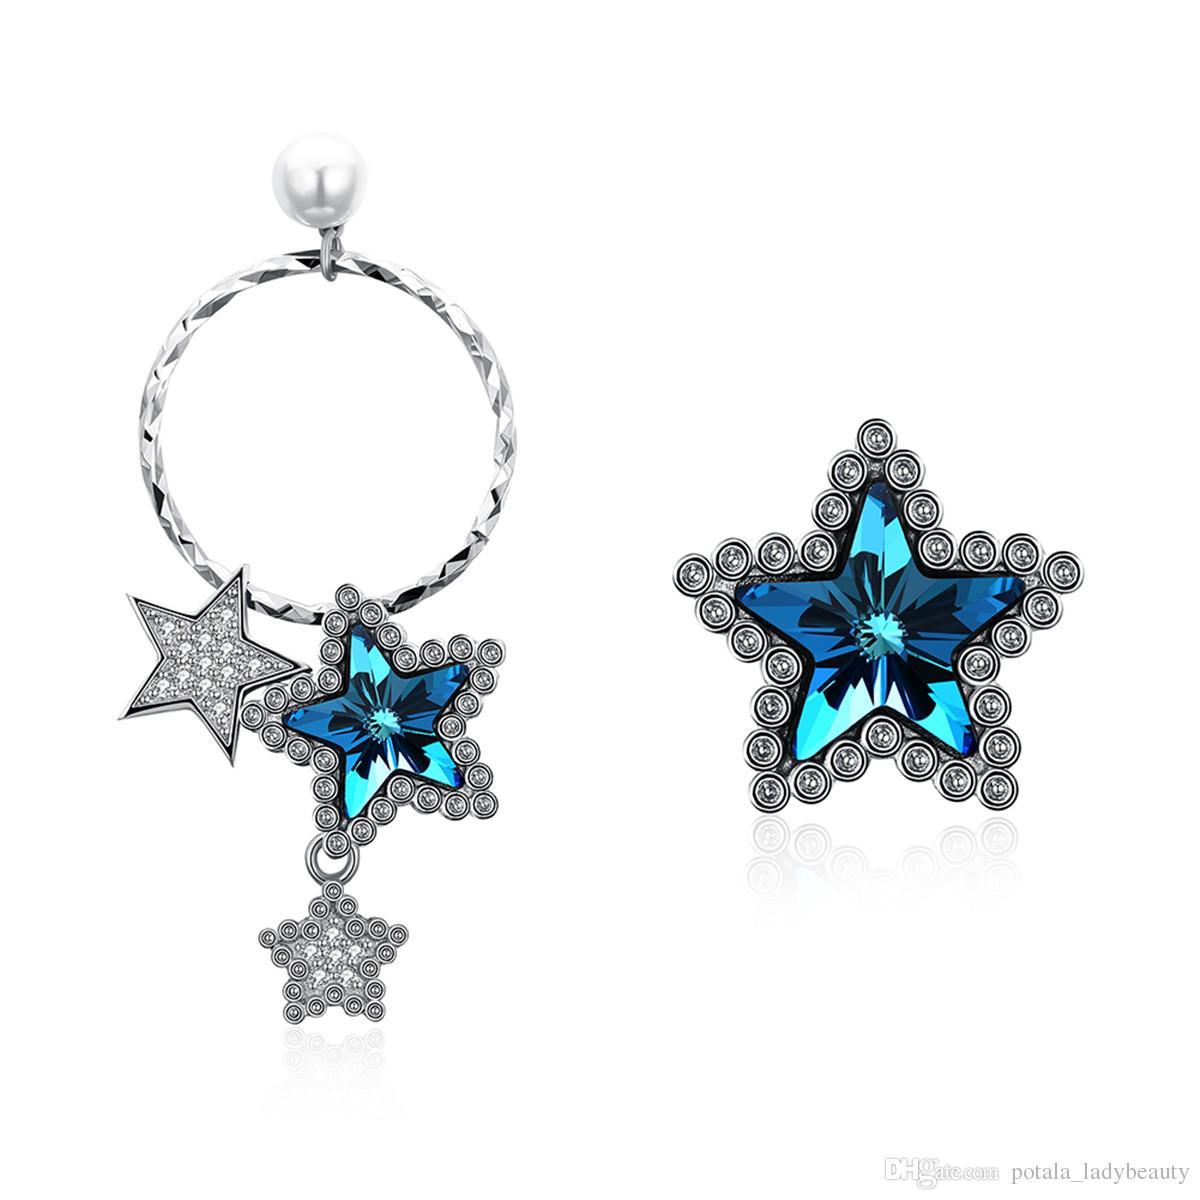 Irregular Star Dangle&Chandelier Earrings Crystal From Swarovski Elements Asymmetrical Starring S925 Sterling Silver Earring Party POTALA164